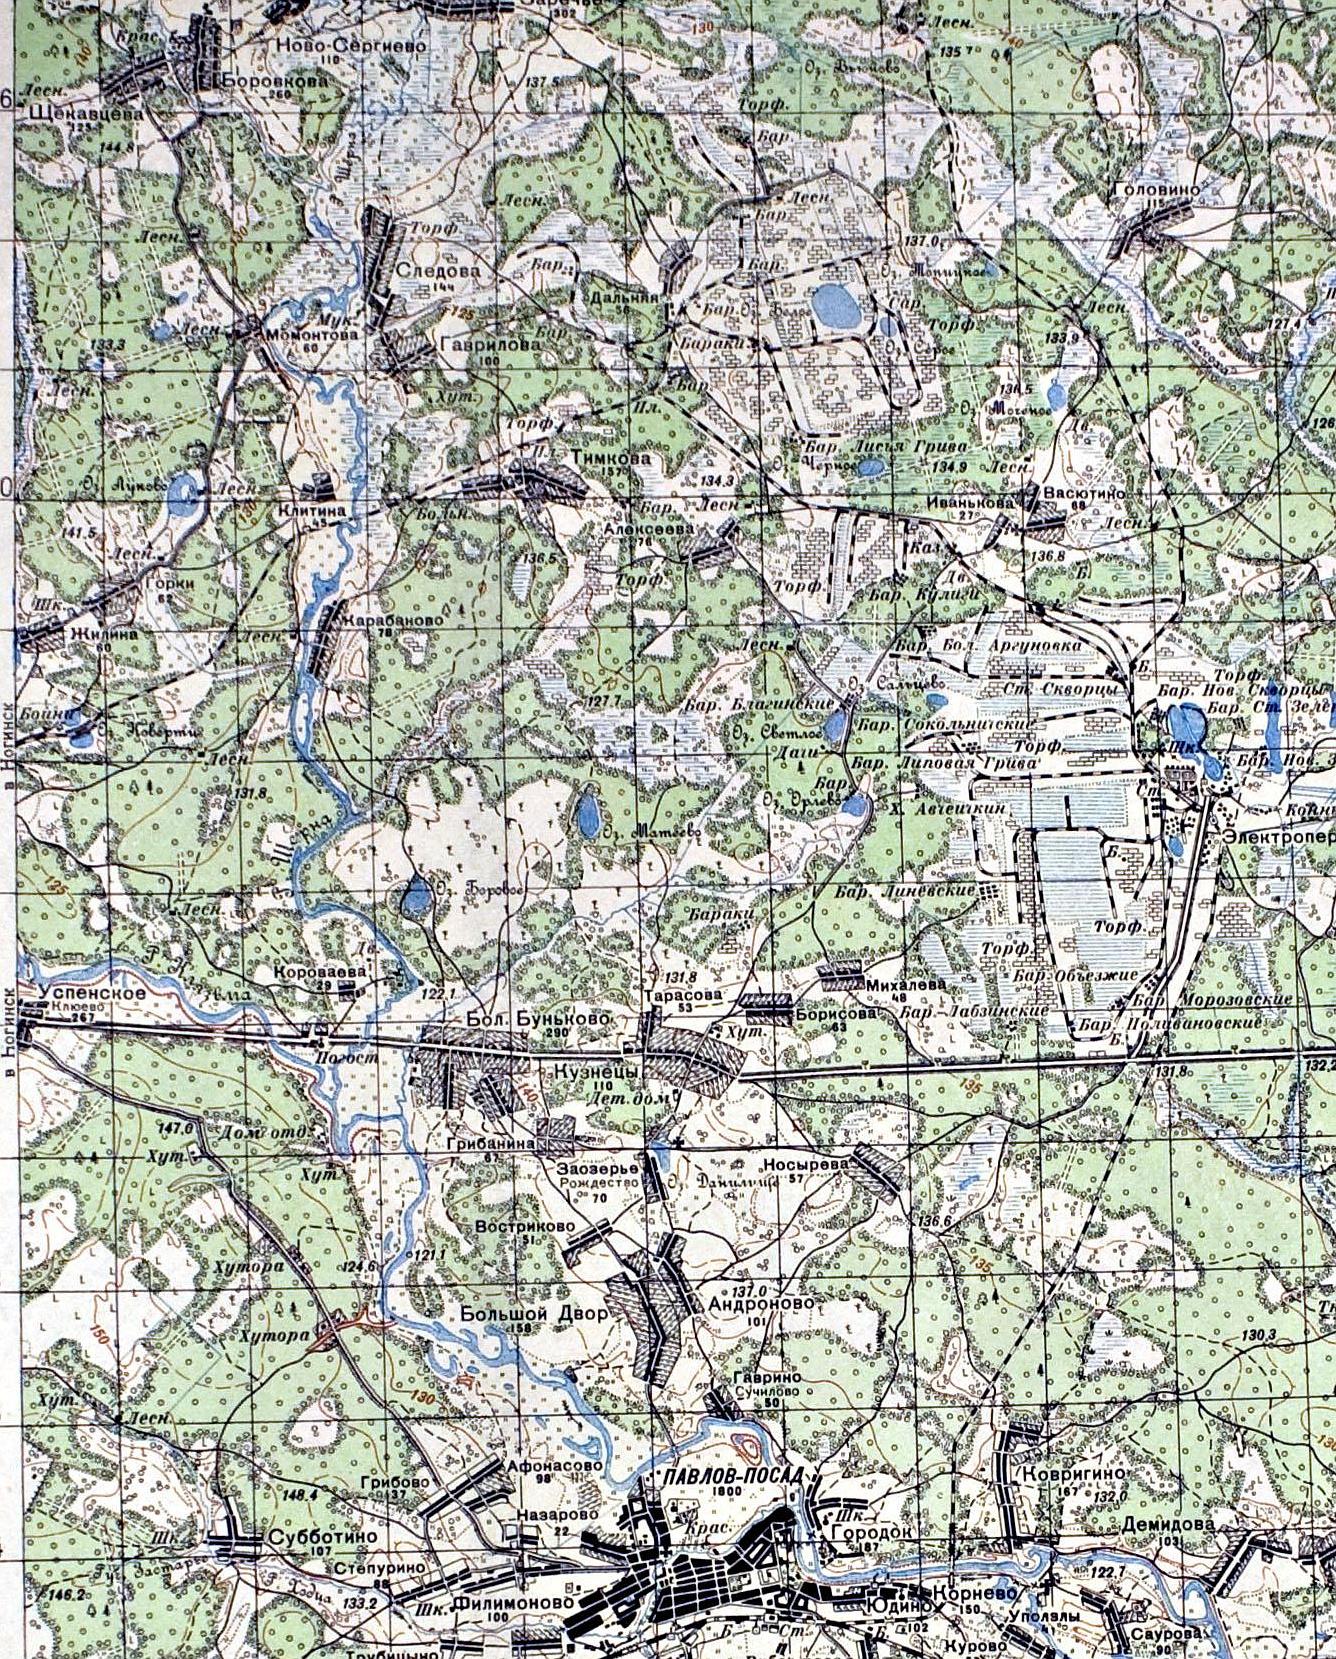 http://narrow.parovoz.com/maps/noginsk-1940-N-37-6.jpg